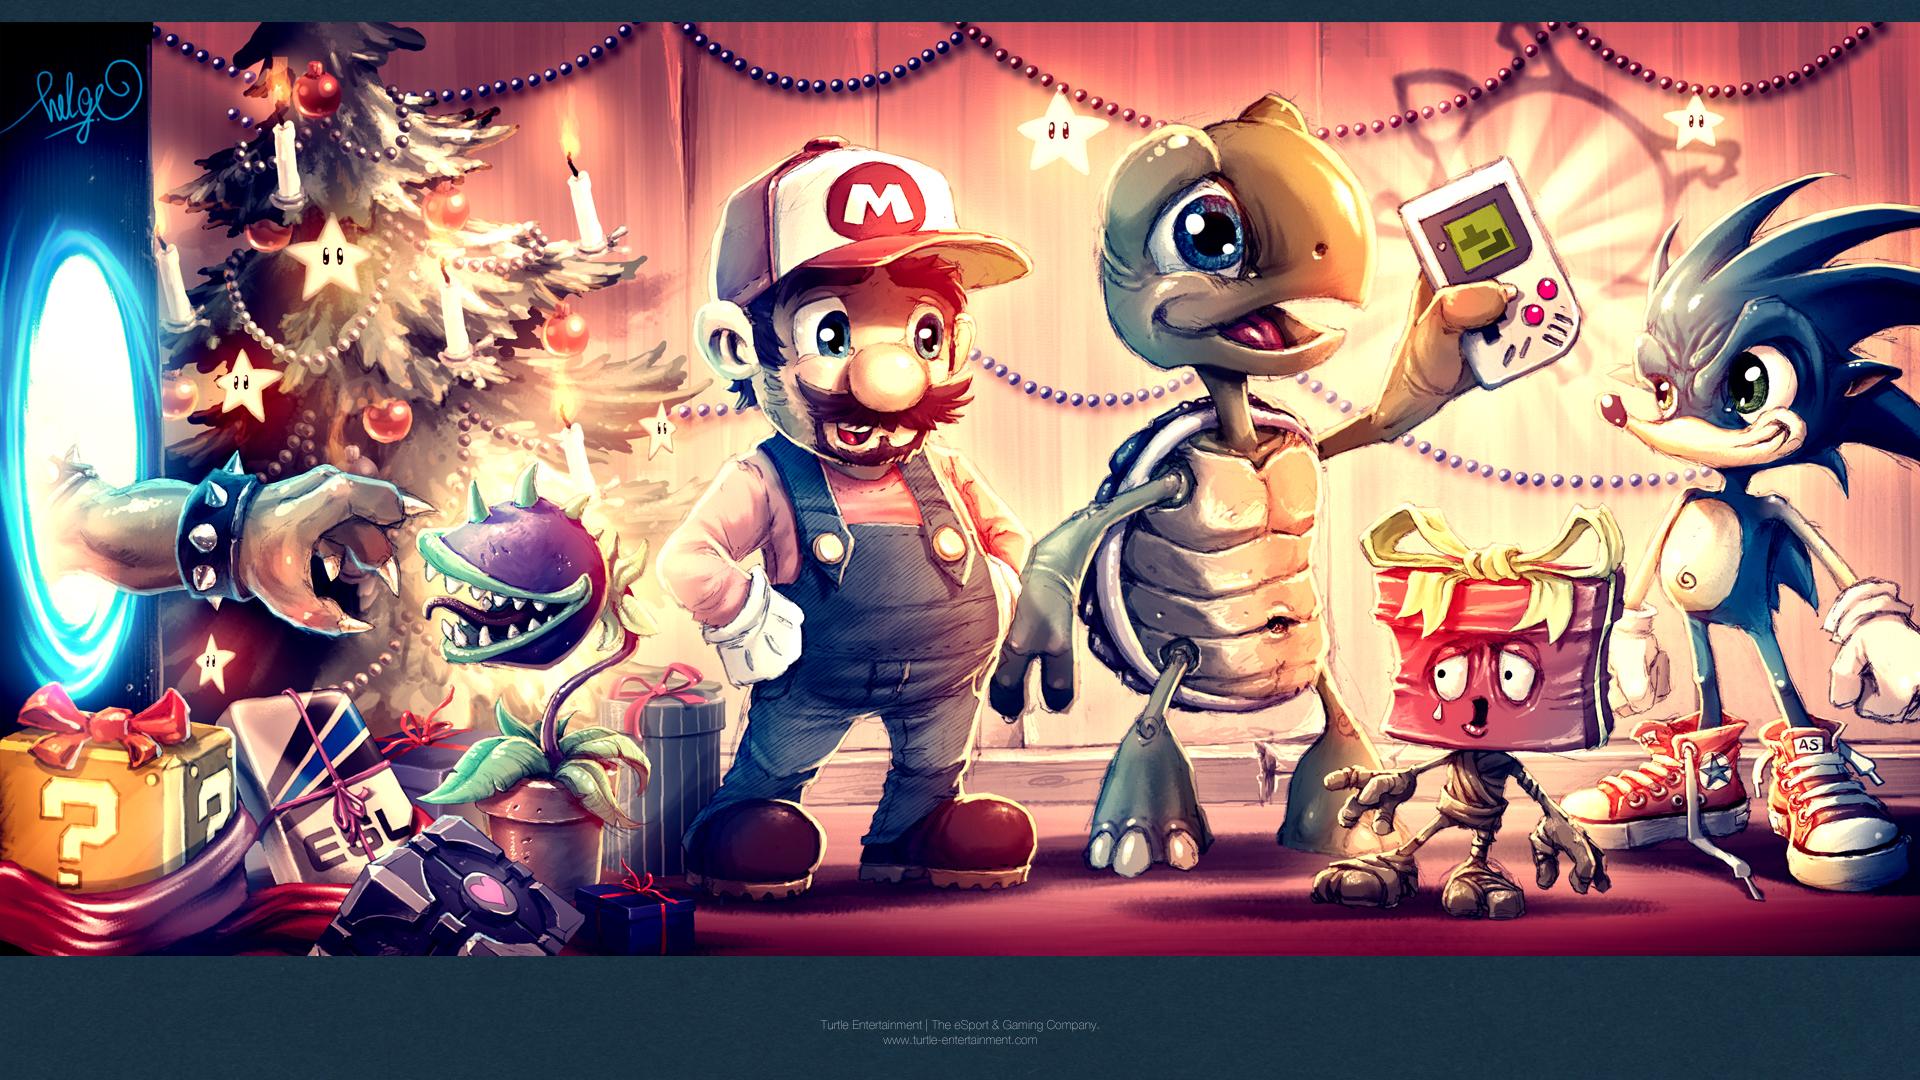 Christmas Zombie Wallpaper.Retro Respawn Christmas Gaming Memories Gaming Respawn